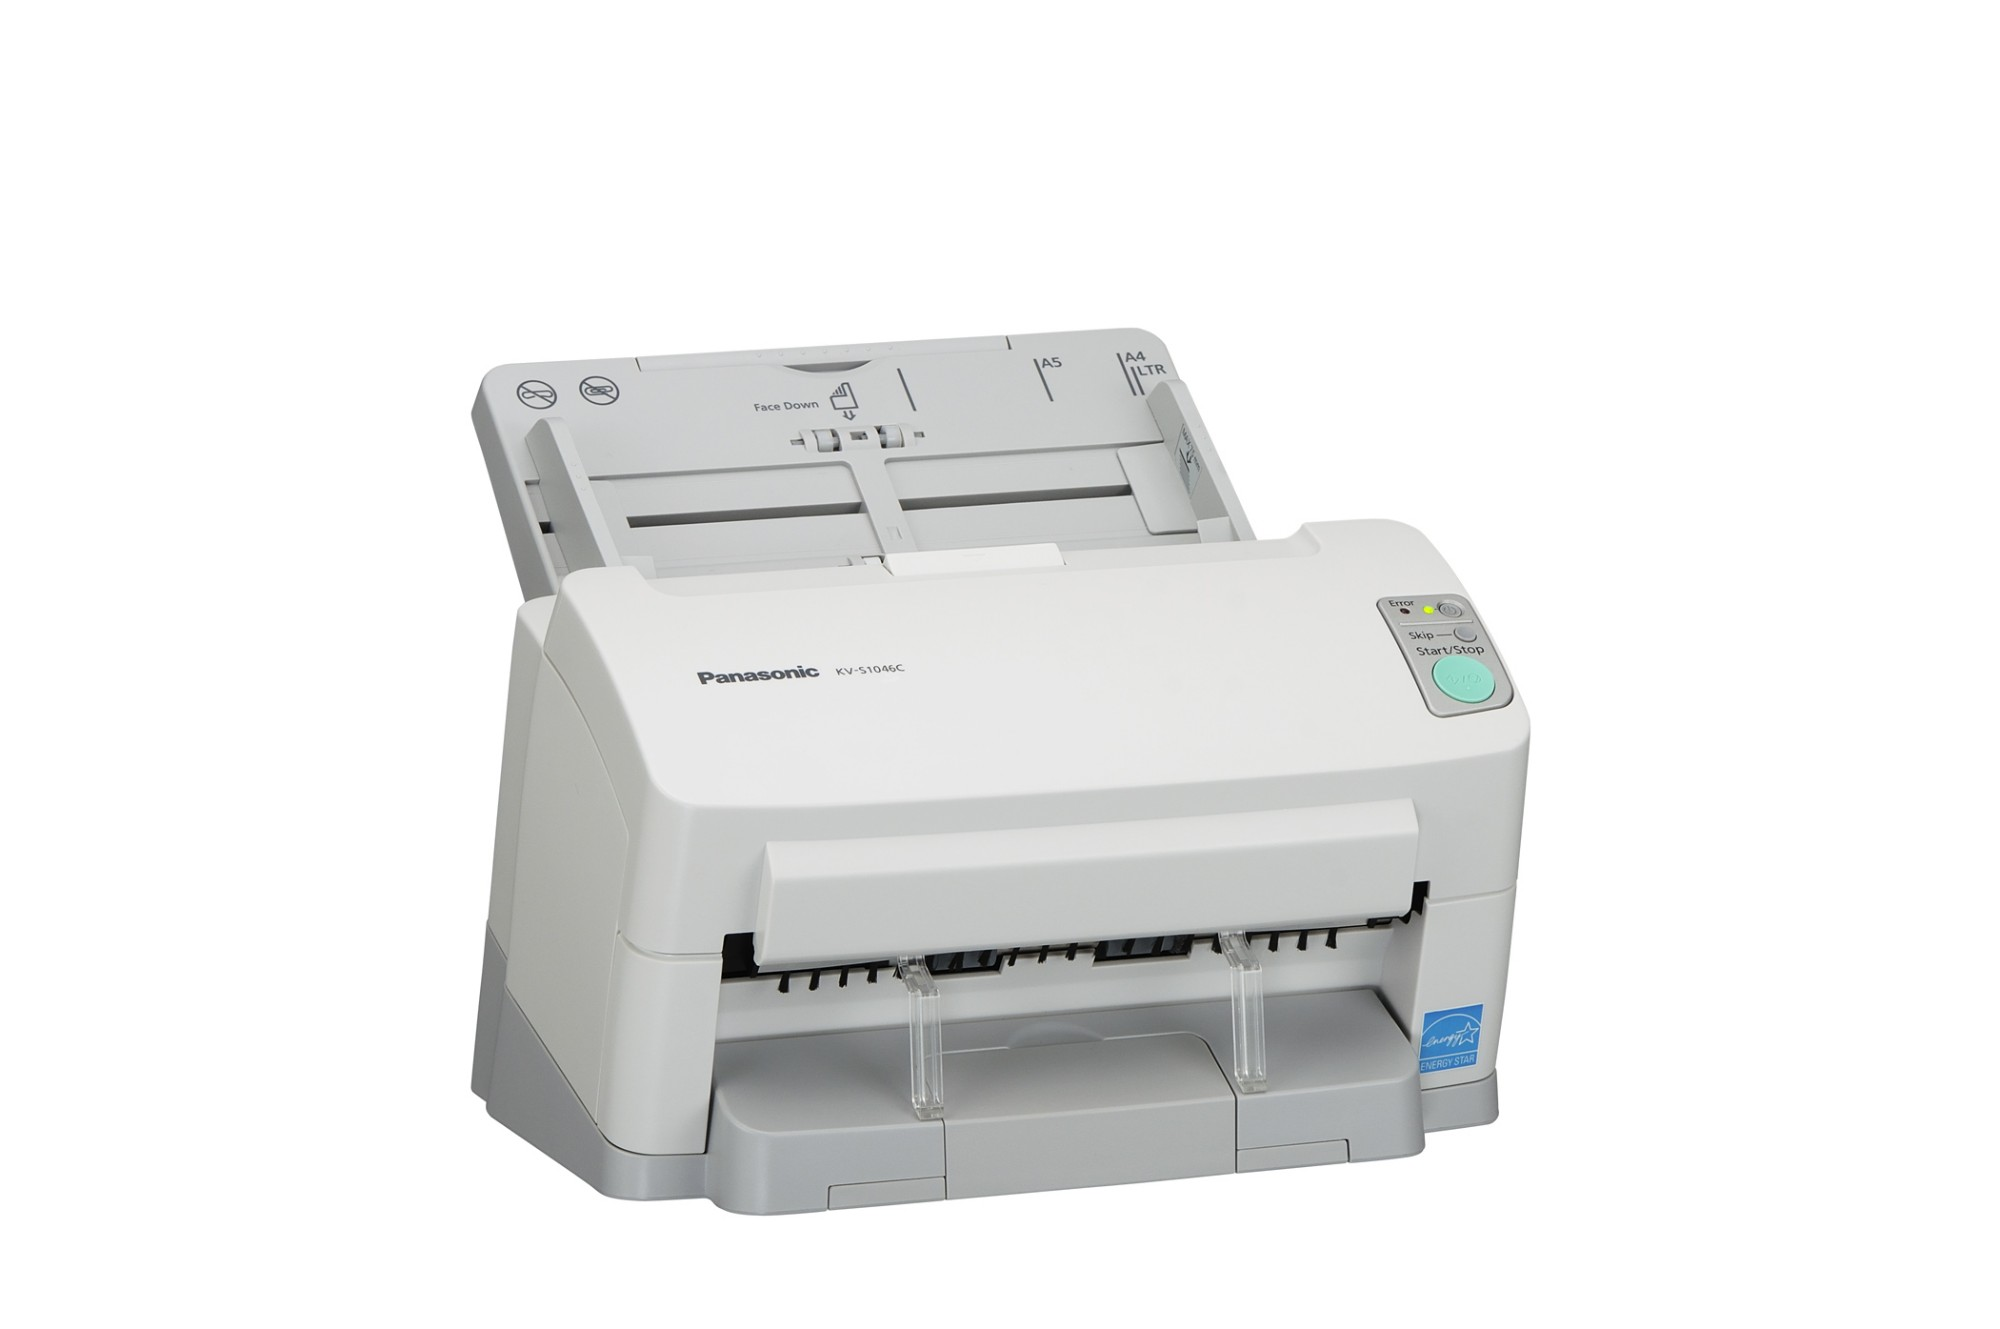 Panasonic KV-S1046C-U scanner 600 x 600 DPI ADF scanner White A4